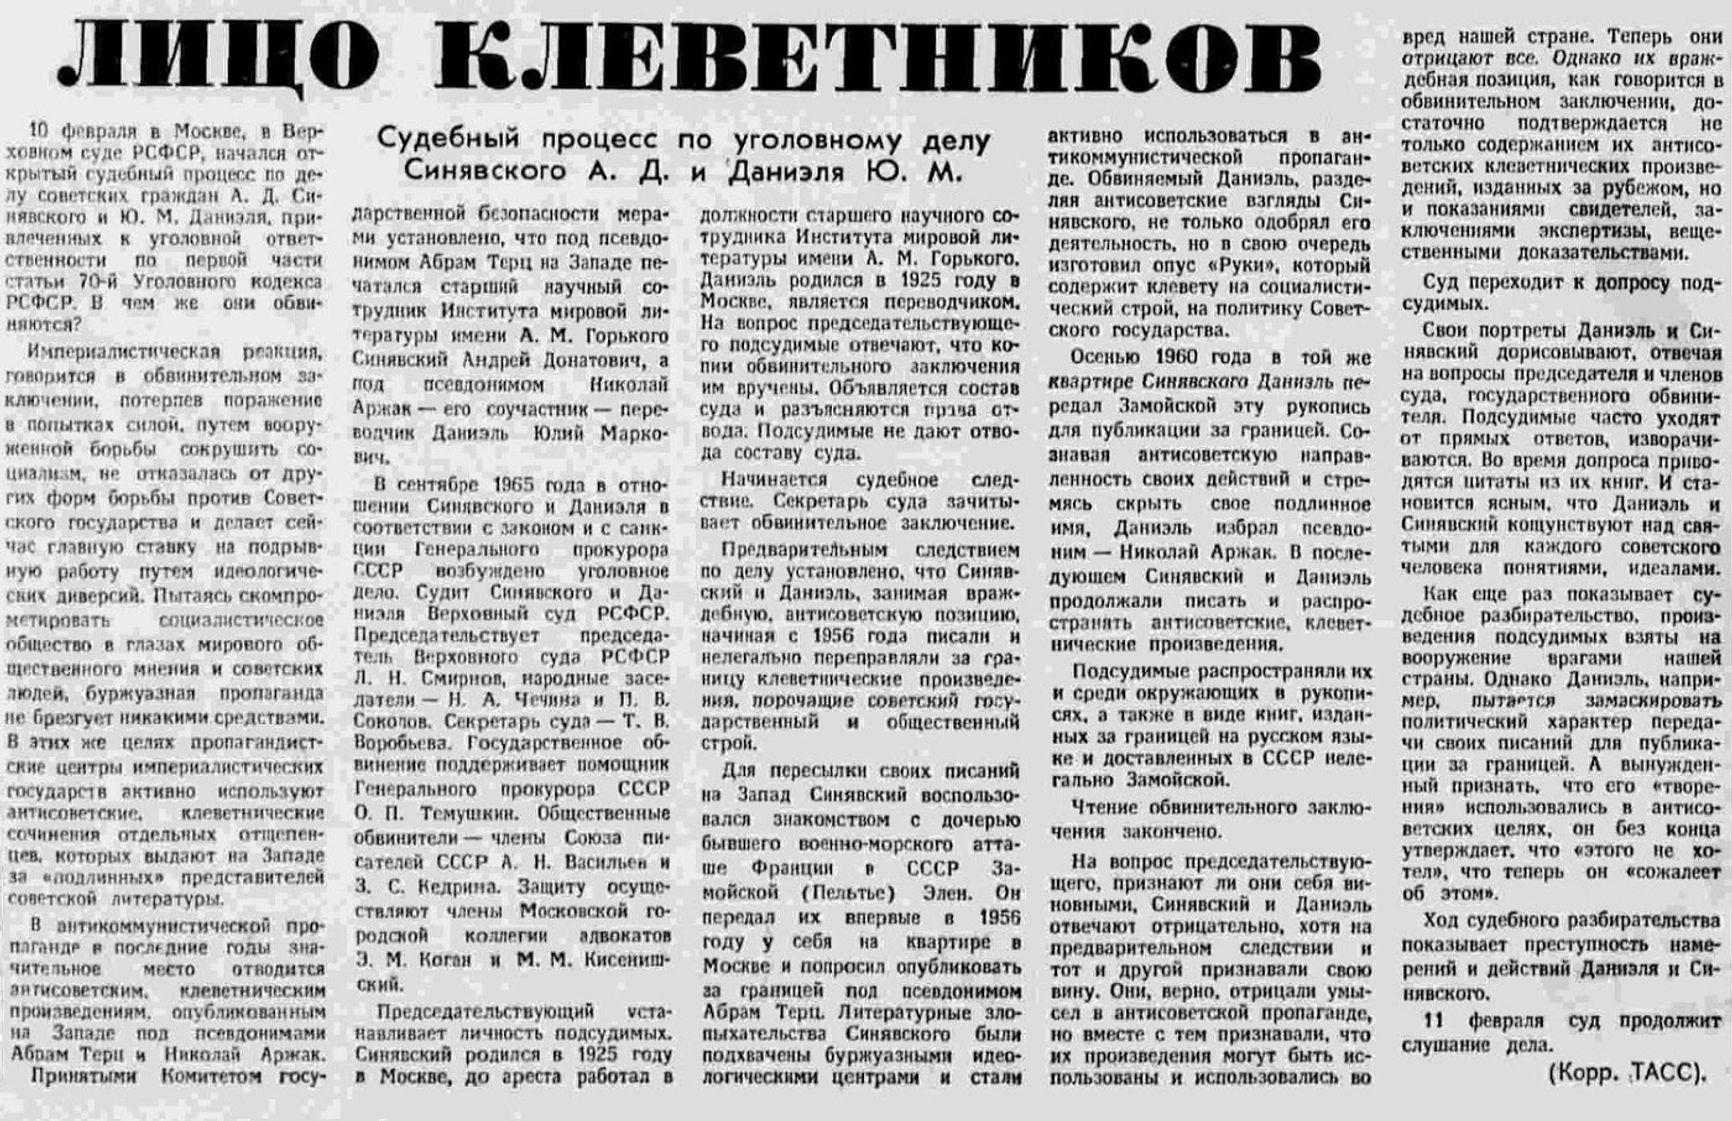 Газета «Правда», 11 февраля 1966 года